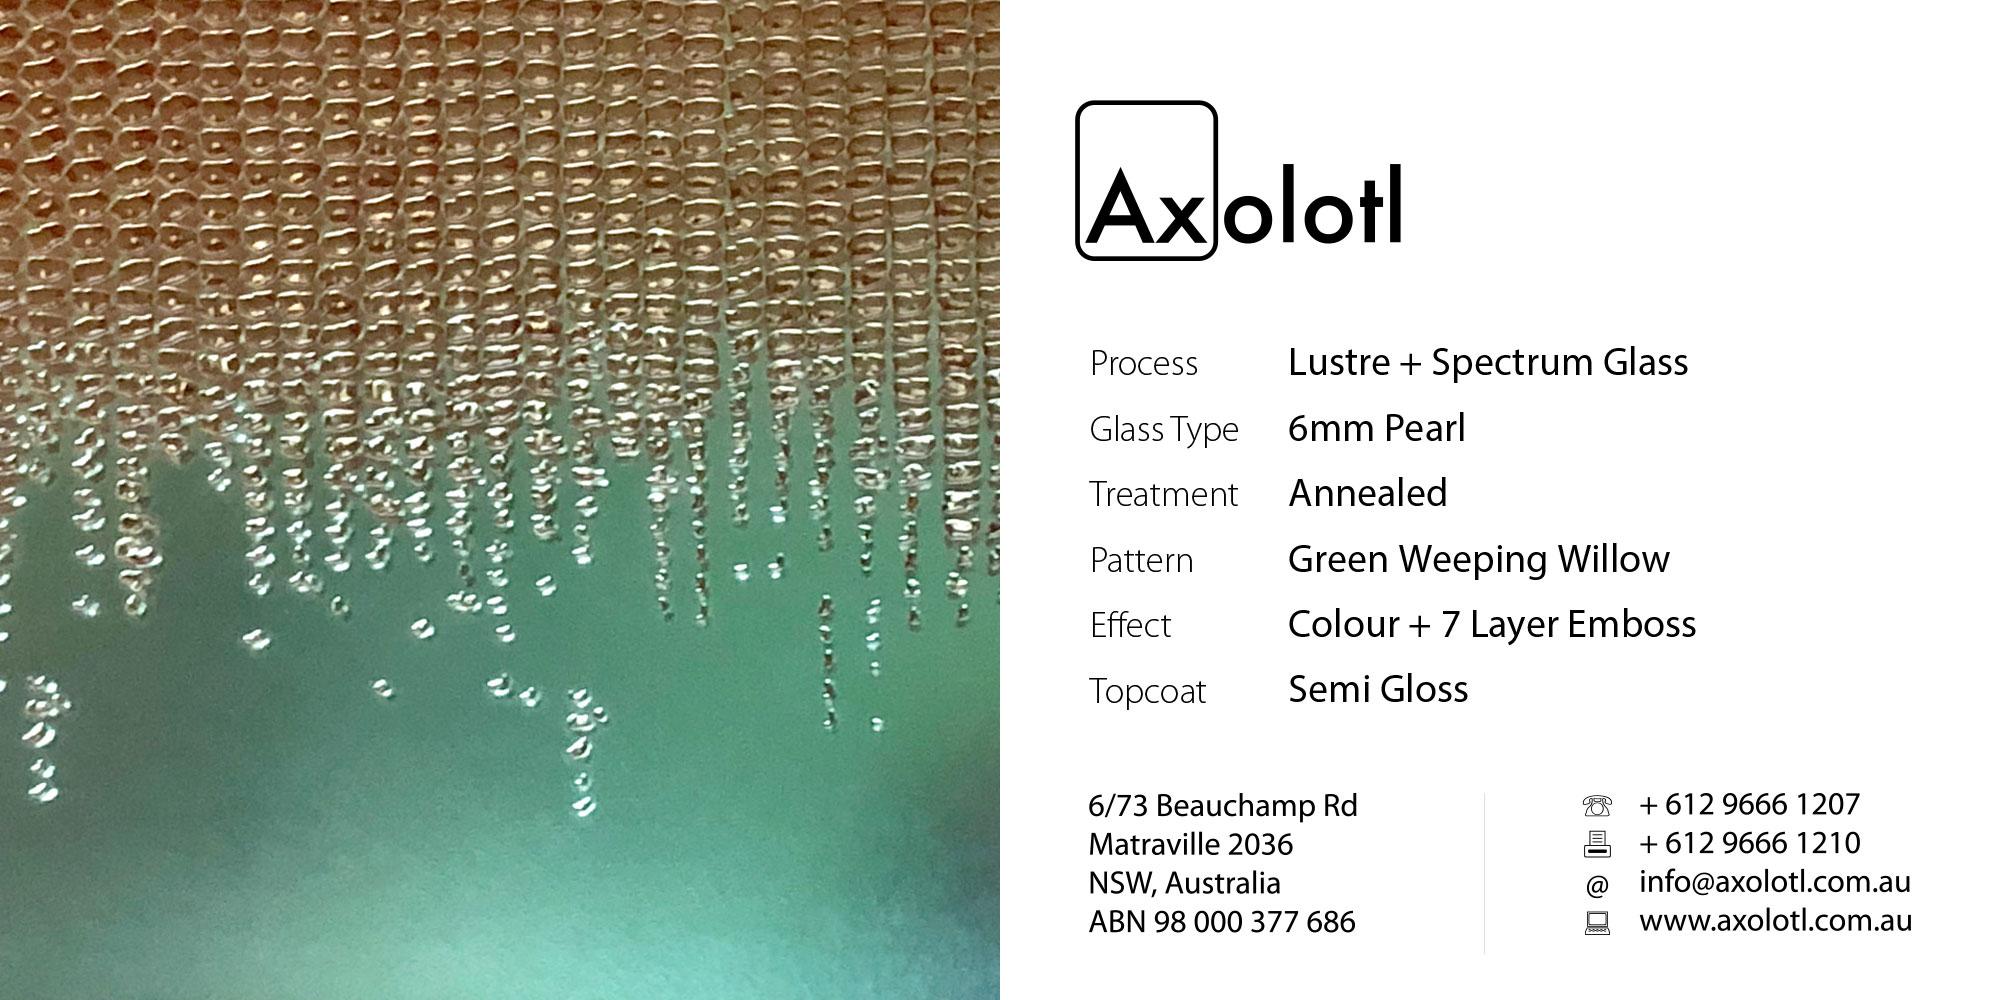 Axolotl_LustreSpectrum_GreenWeepingWillow.jpg